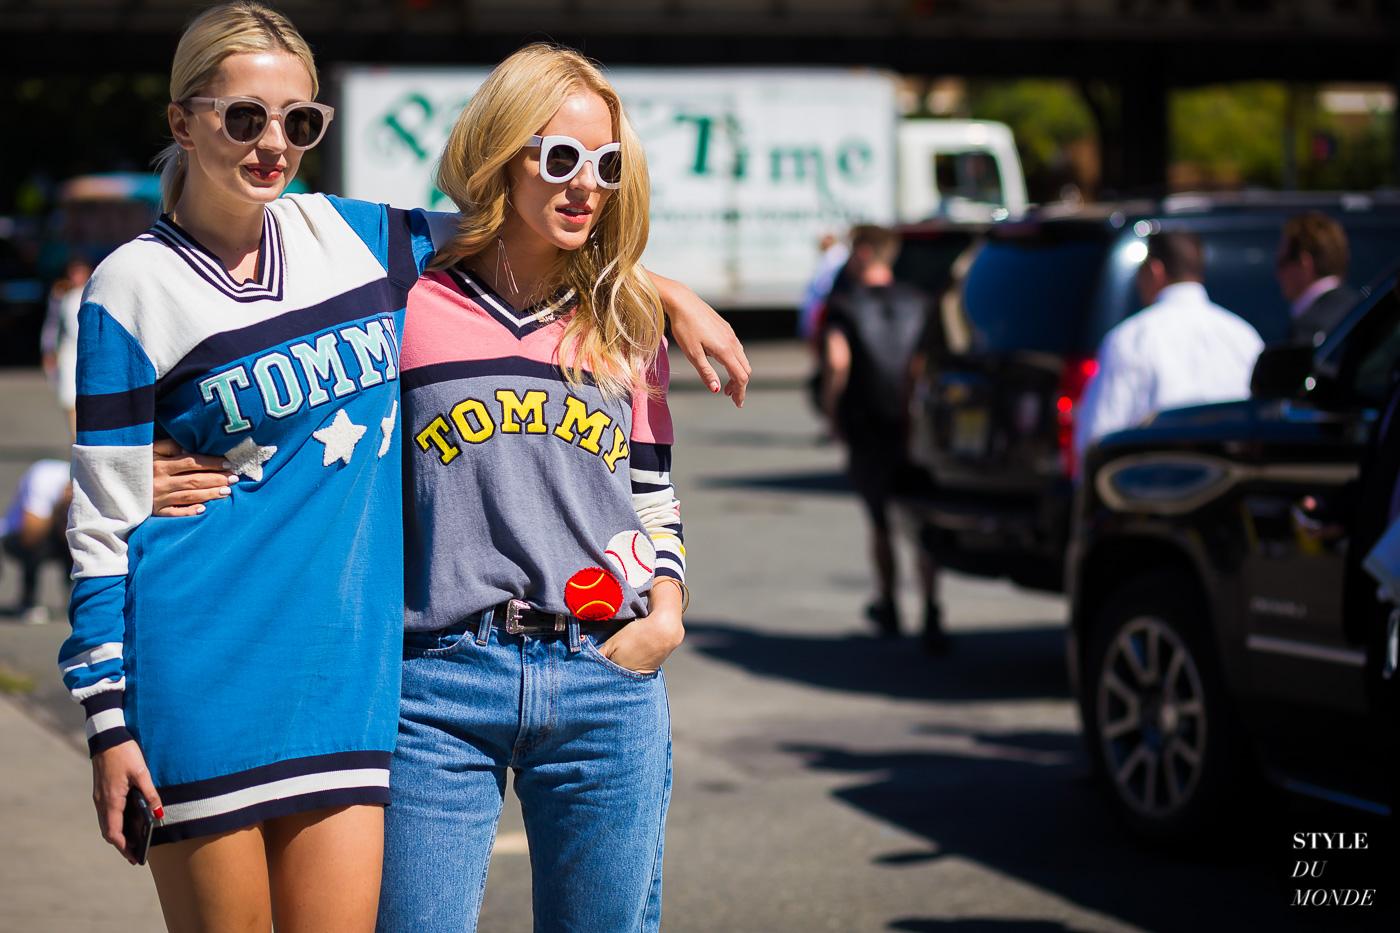 204172d6b95f Caroline Vreeland and Shea Marie Street Style Street Fashion Streetsnaps by STYLEDUMONDE  Street Style Fashion Photography